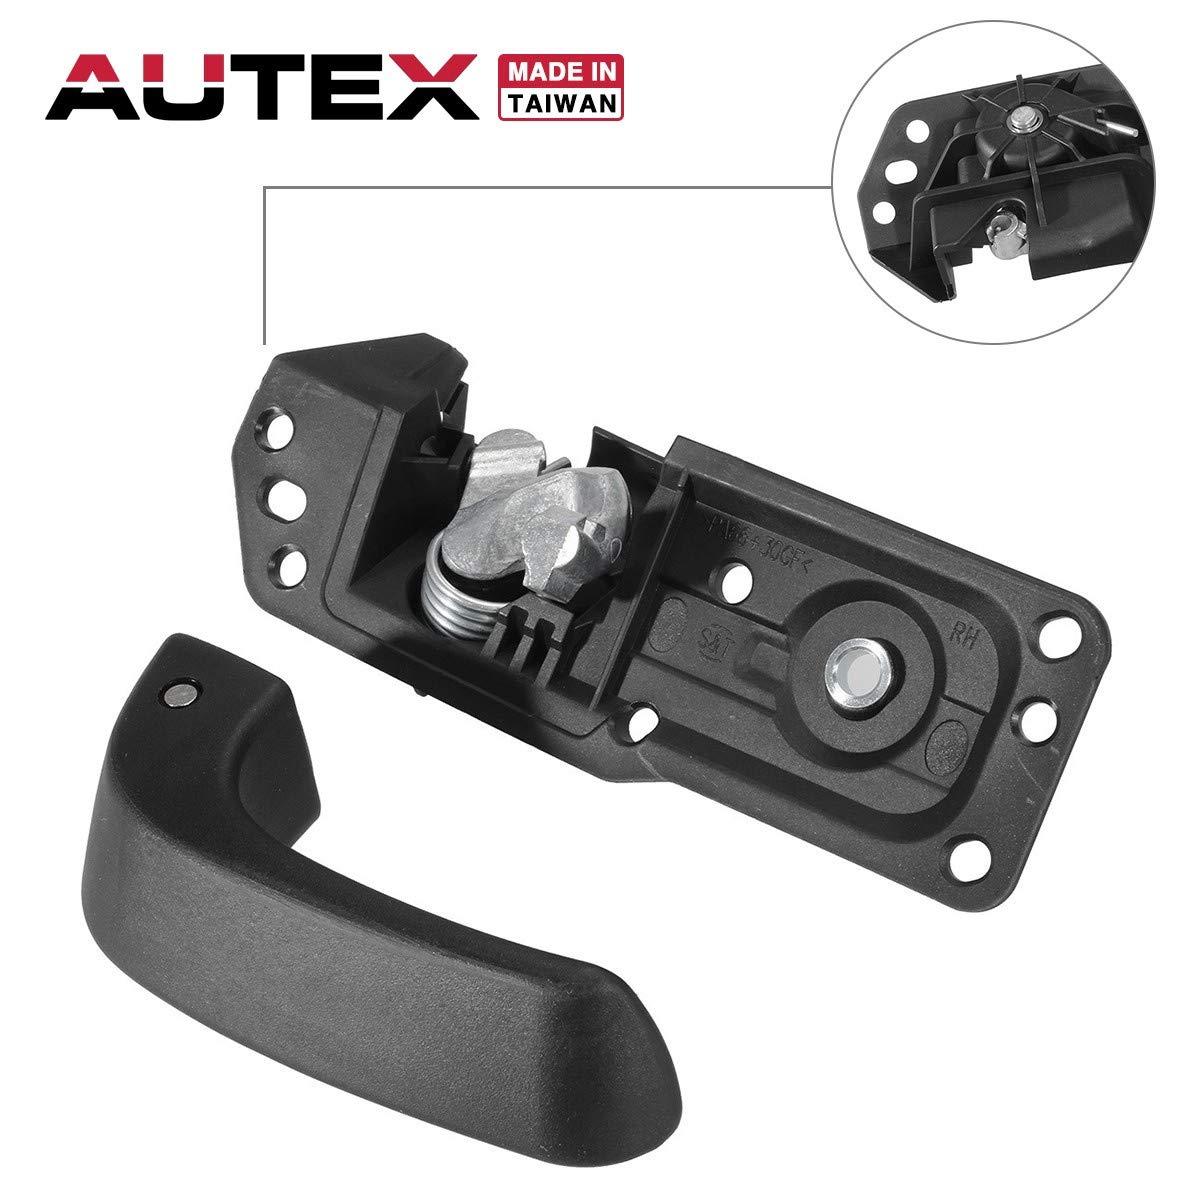 AUTEX 80375 Front/Rear Right Door Handle Interior Inside Passenger Side Compatible with 2007 2008 2009 2010 2011 2012 2013 Chevy Silverado 1500/2500HD/3500HD GMC Sierra 1500 2500HD 3500 20833602